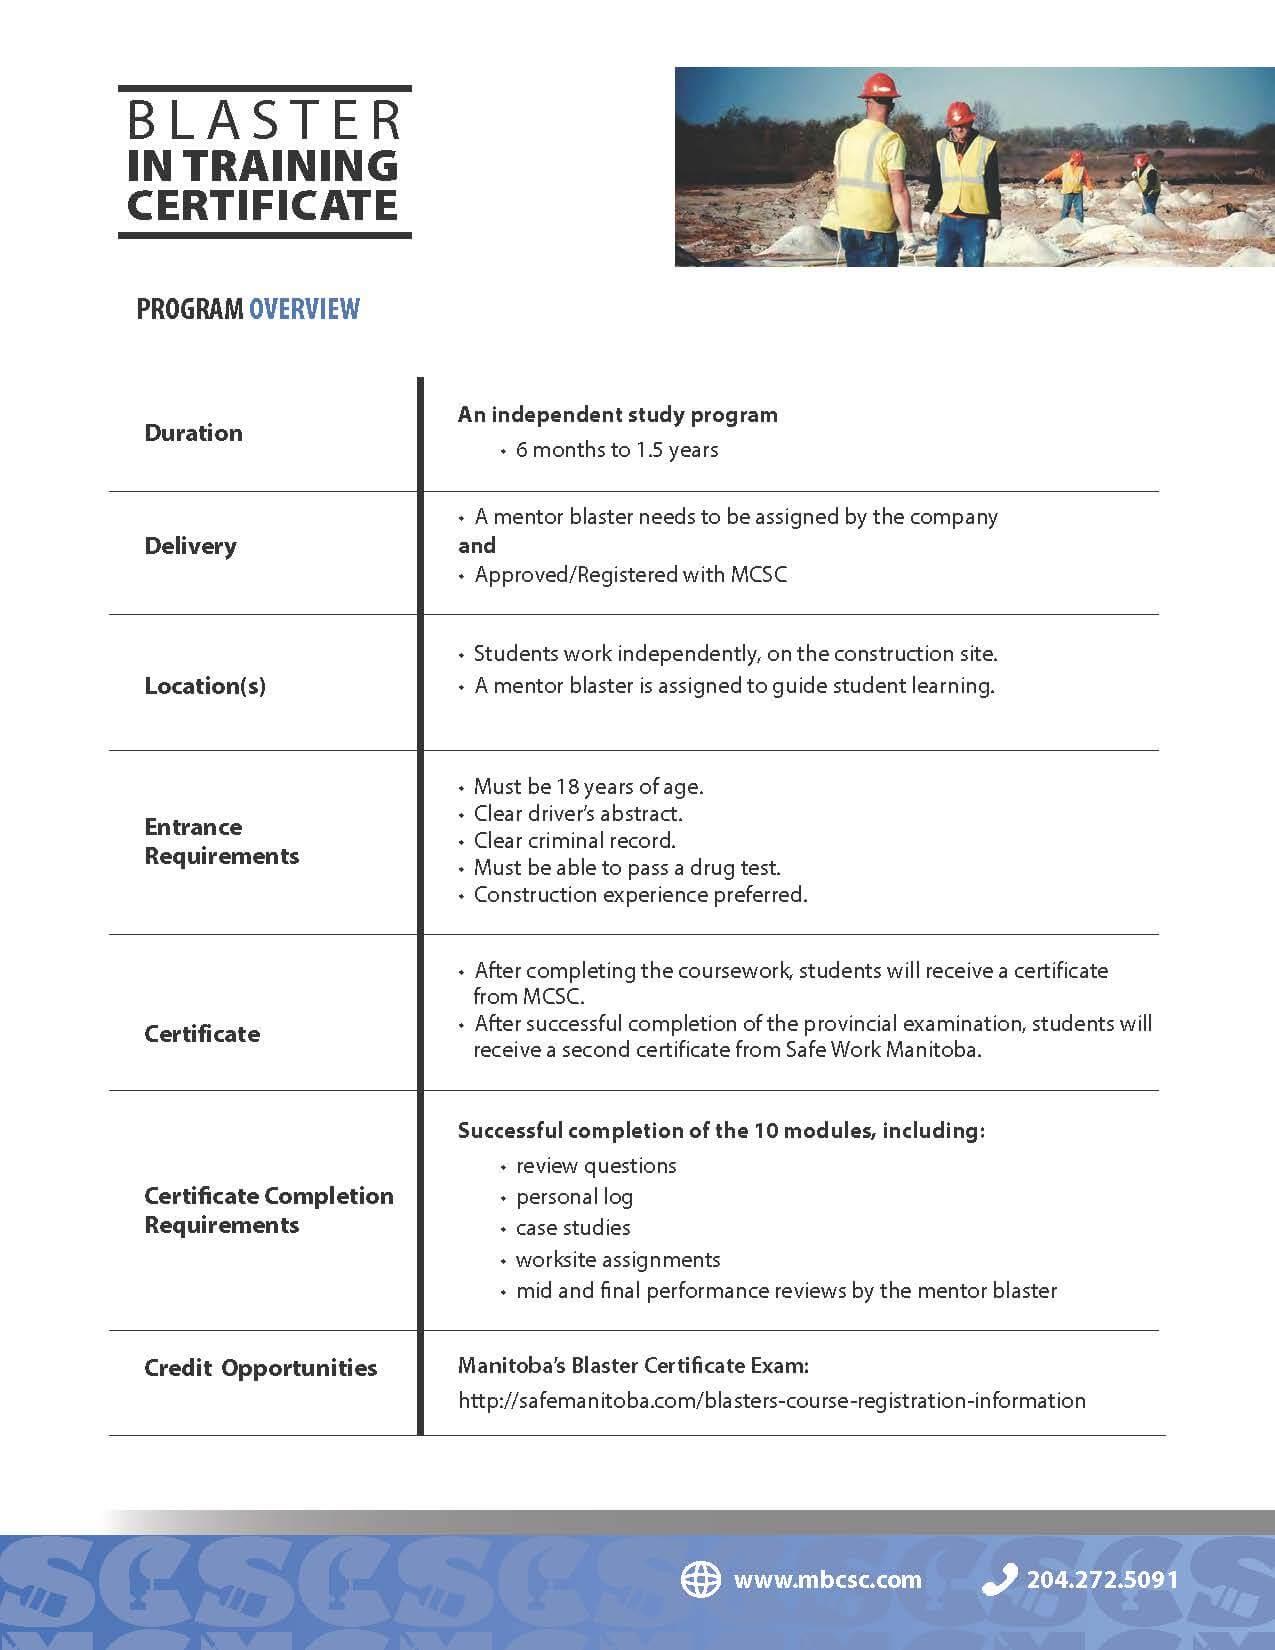 Blaster in Training Certificate